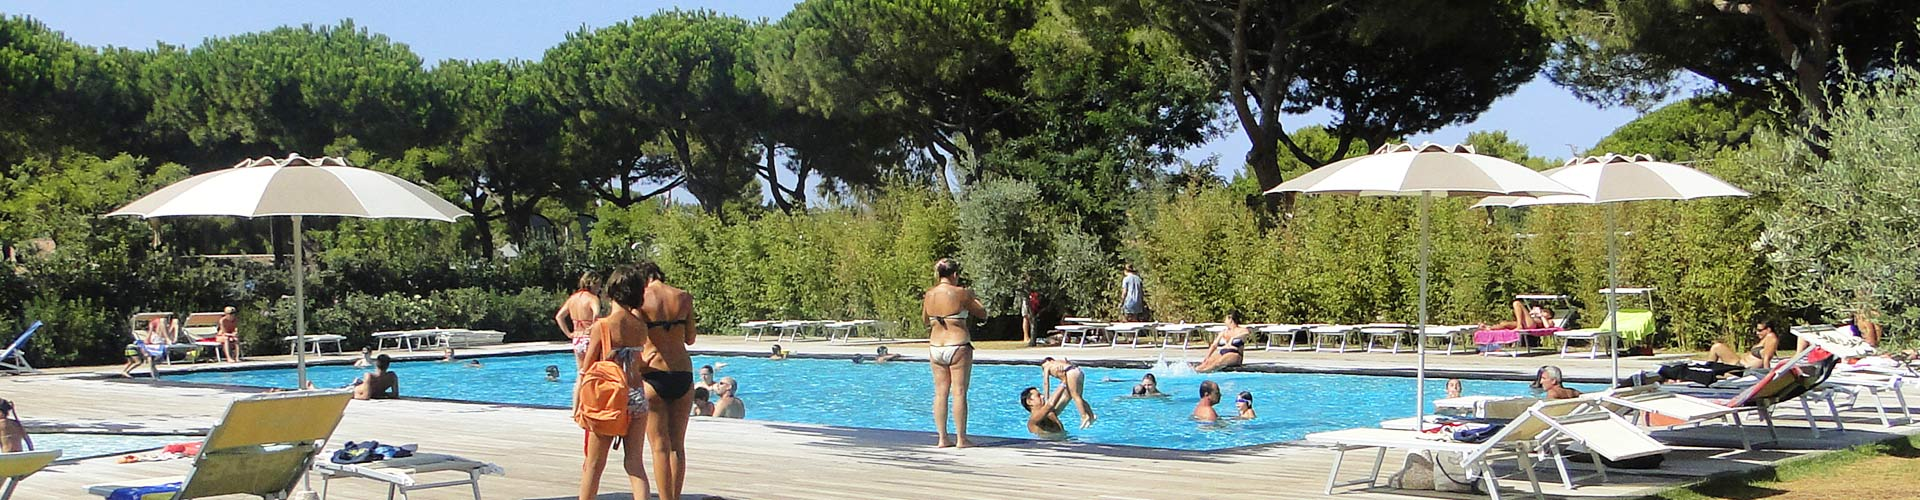 Camping sardaigne bord de mer avec piscine for Camping calvados bord de mer avec piscine